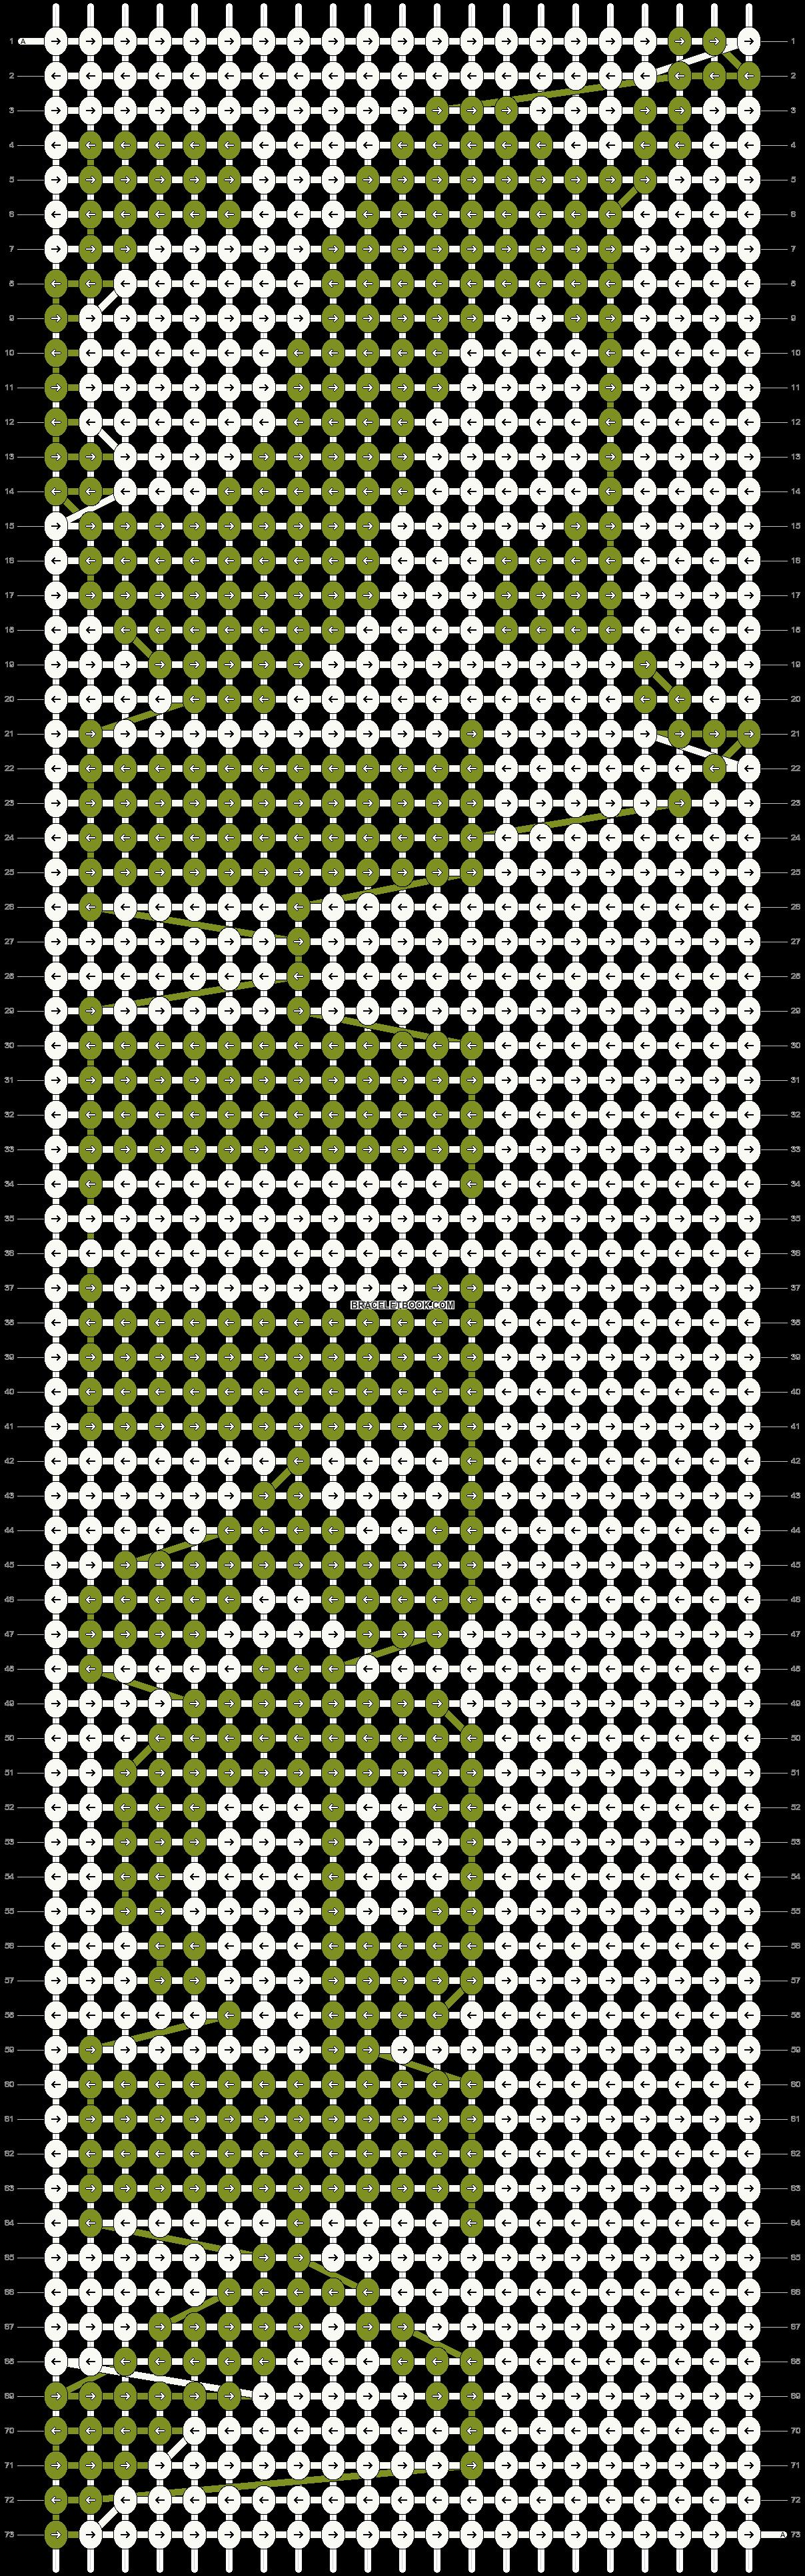 Alpha pattern #1173 pattern